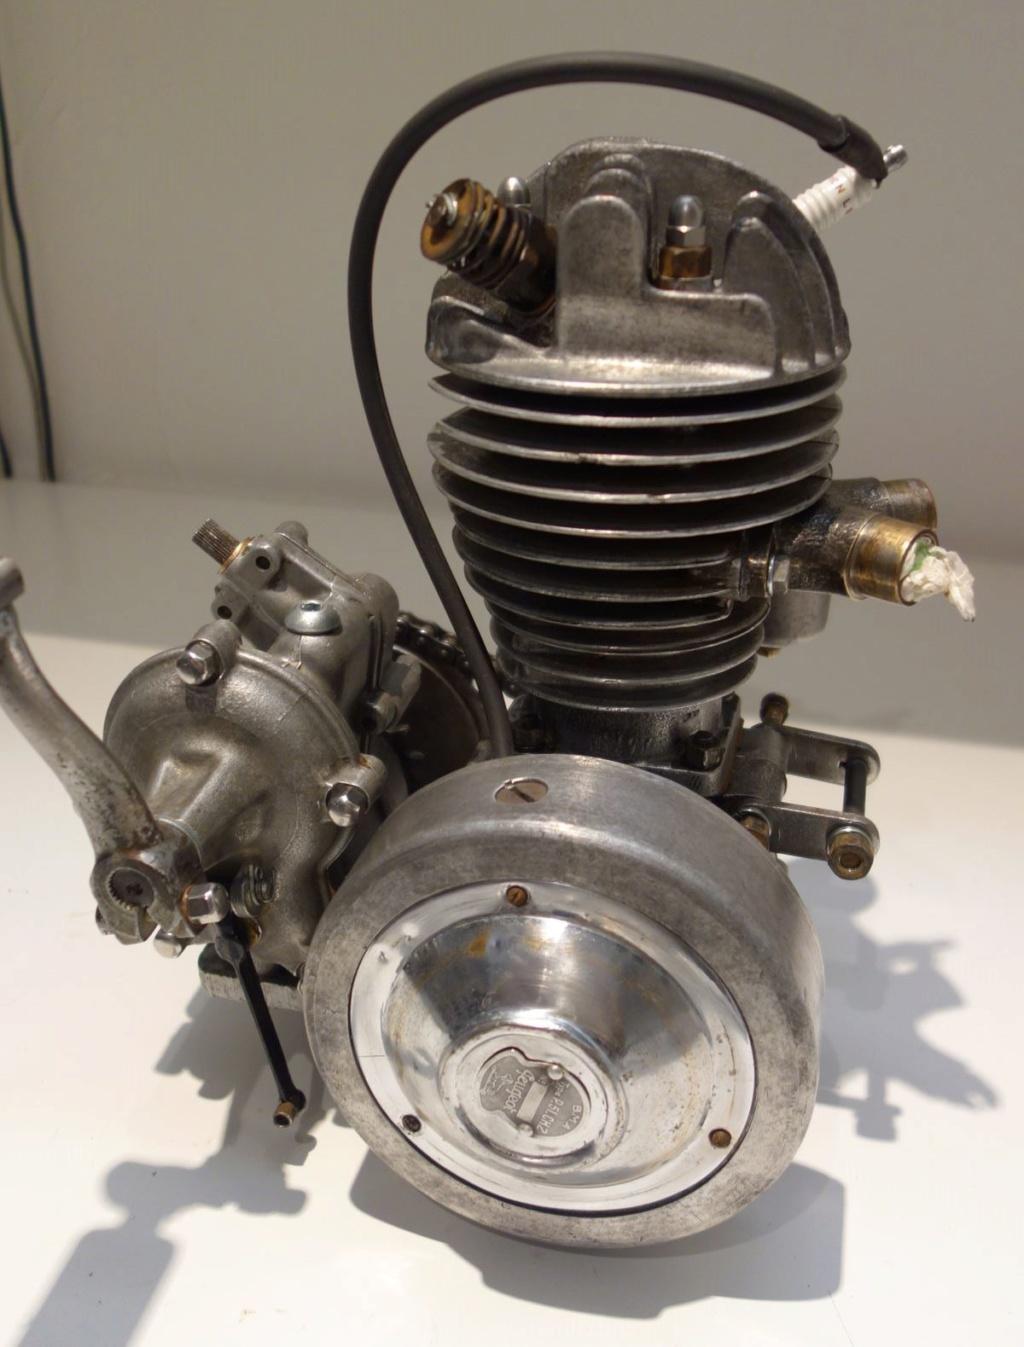 PEUGEOT P51 CLK2 1938 restauration _copie59